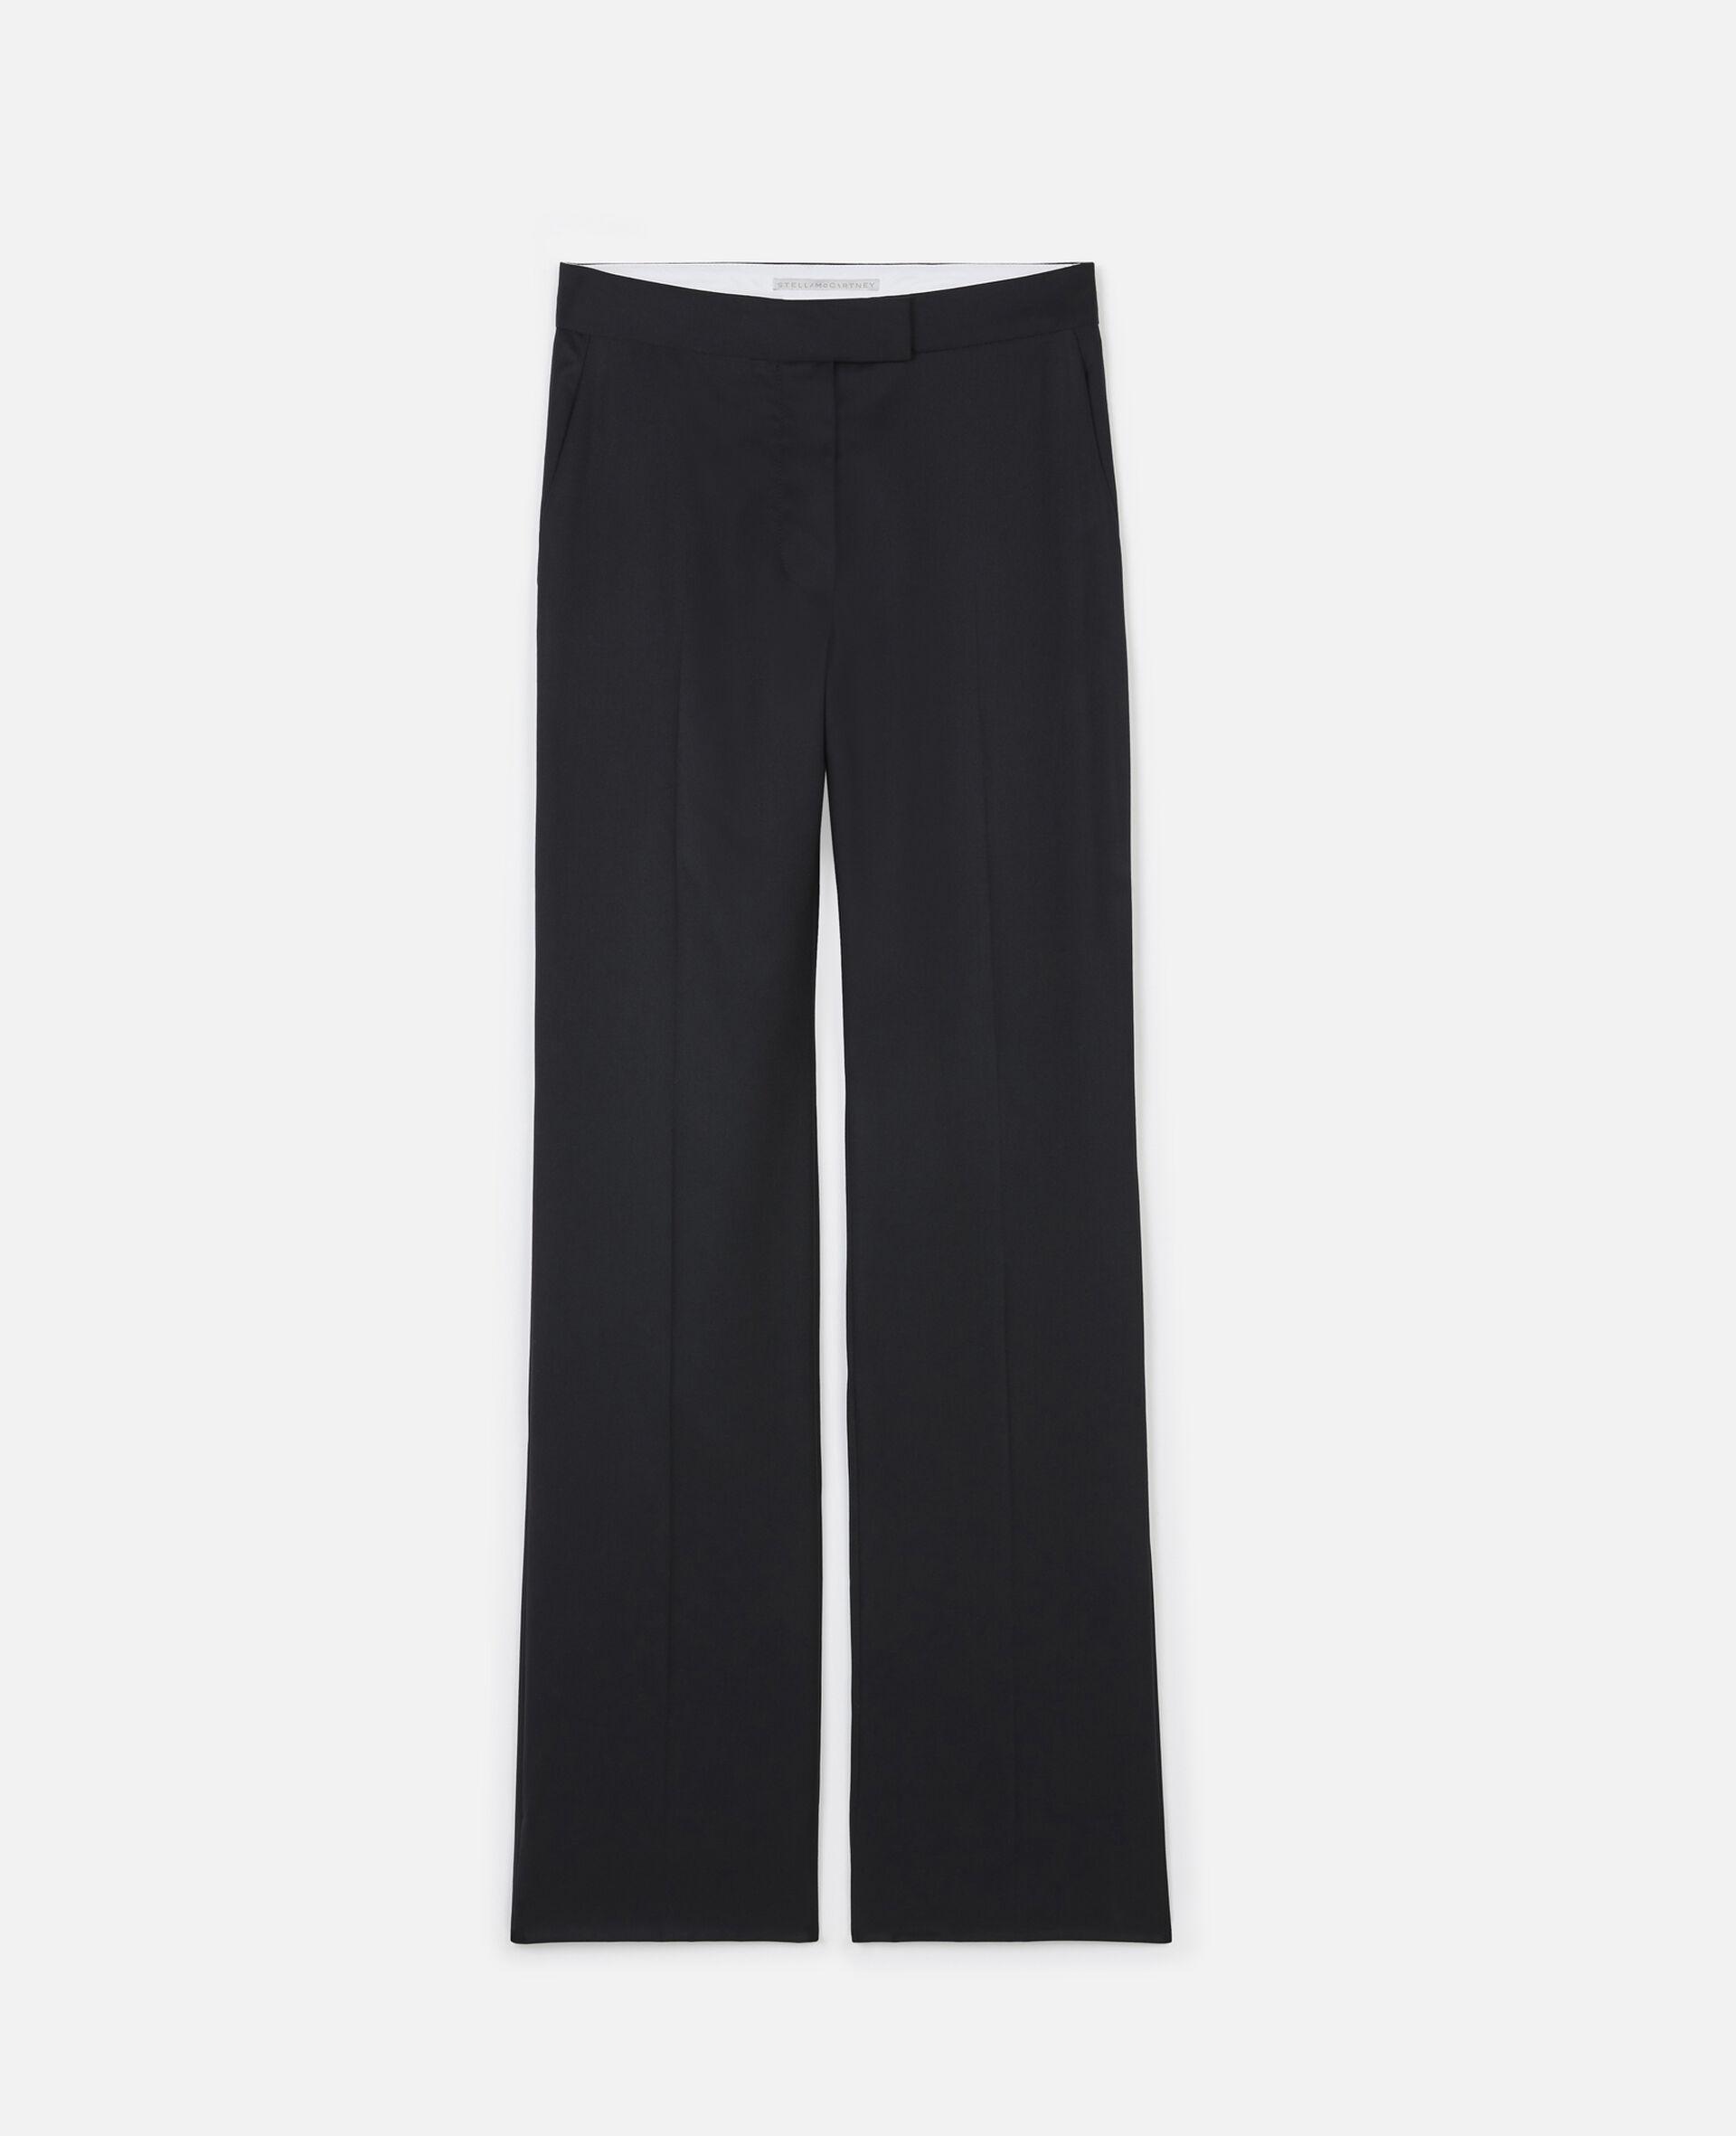 Pantalon Apollo Bay -Noir-large image number 0